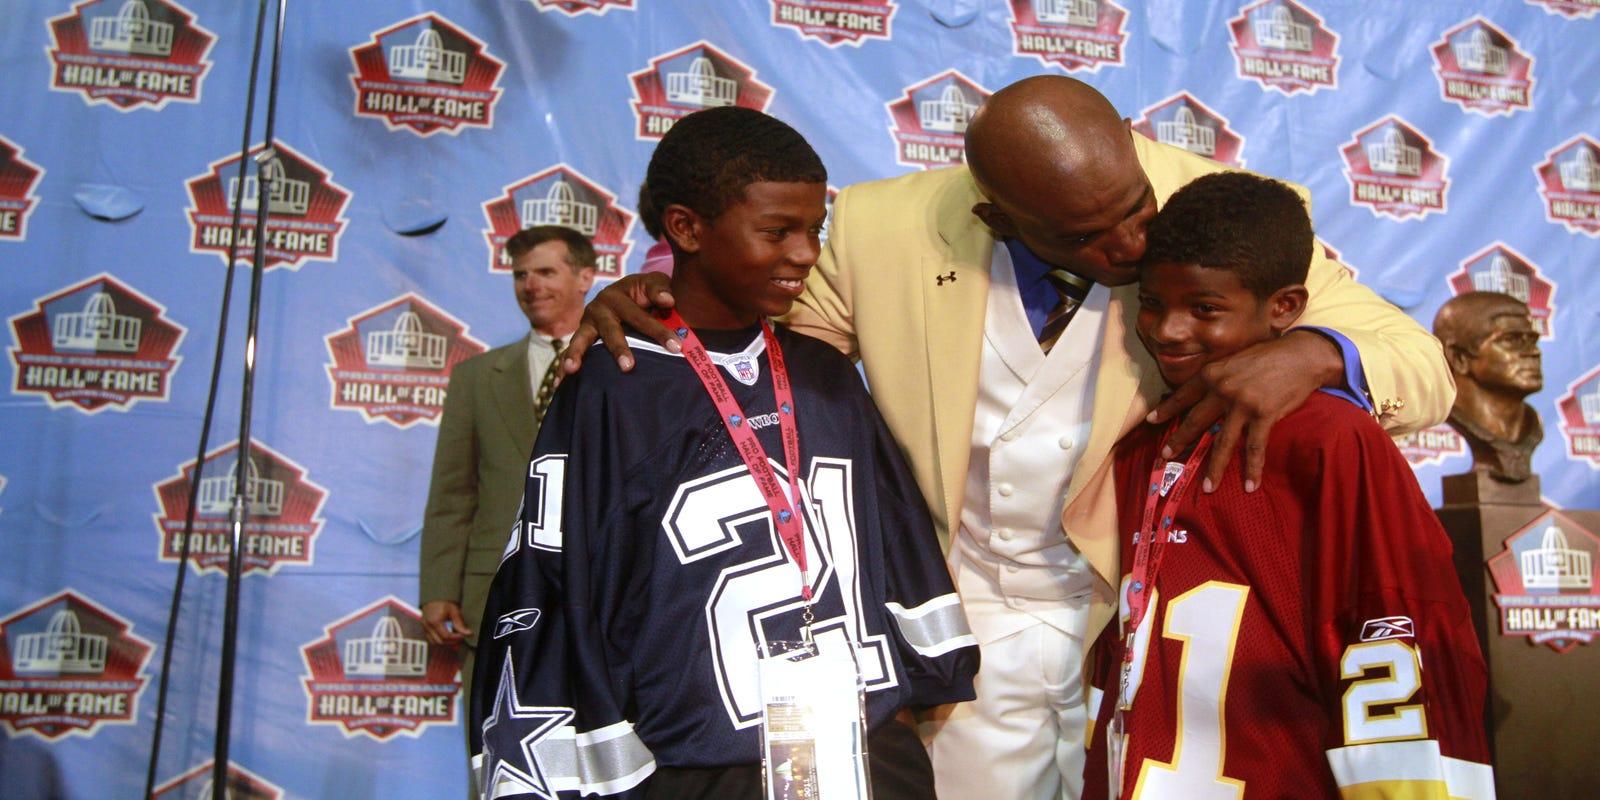 Deion Sanders' son, Shilo, commits to play at South Carolina